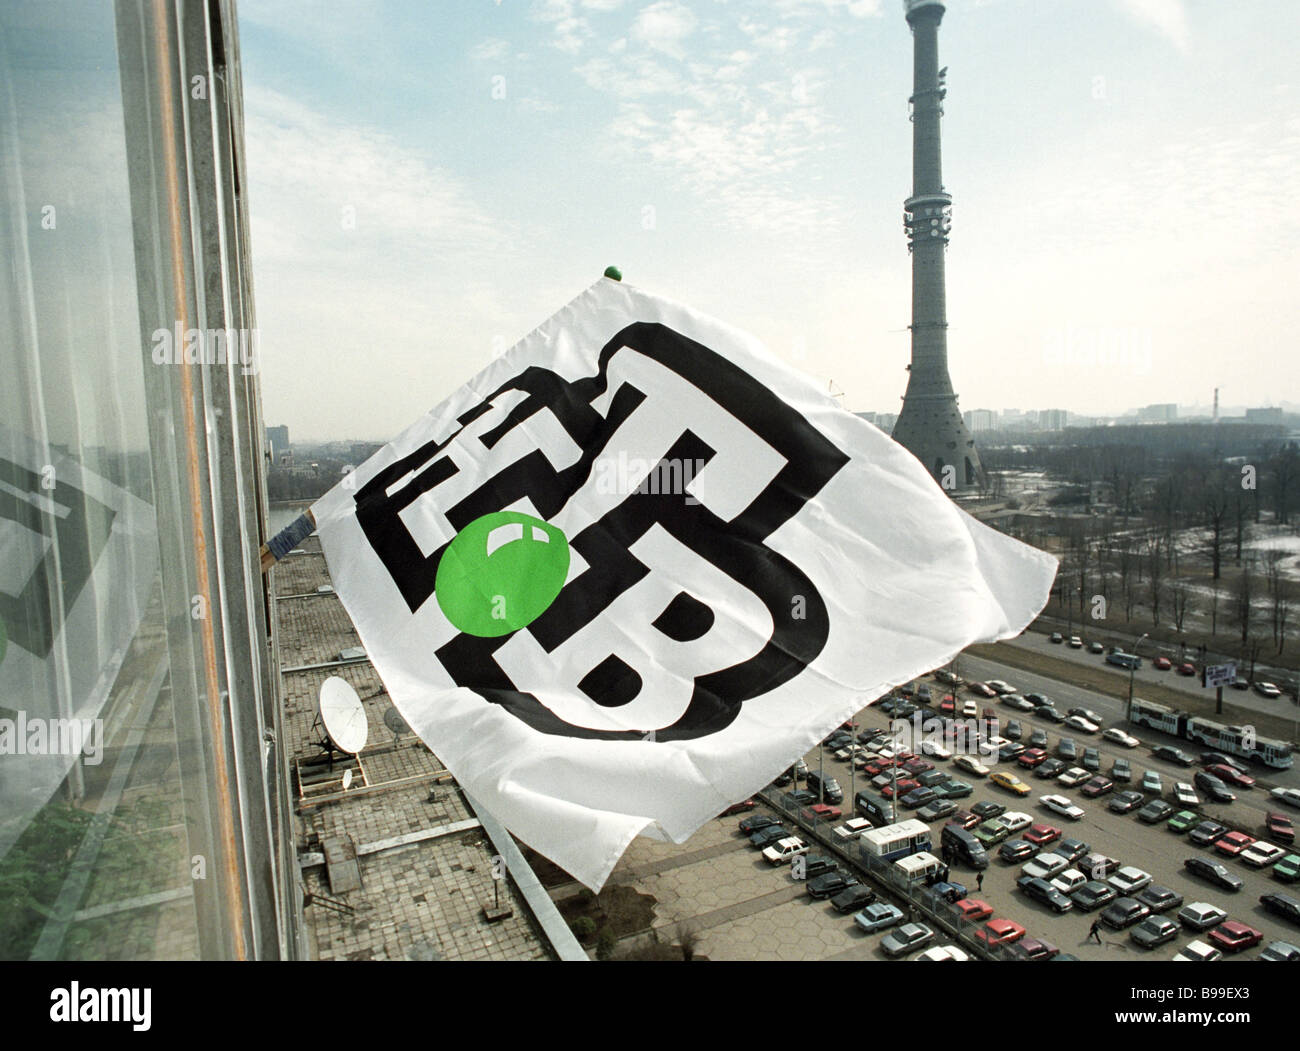 The NTV television company logotype - Stock Image